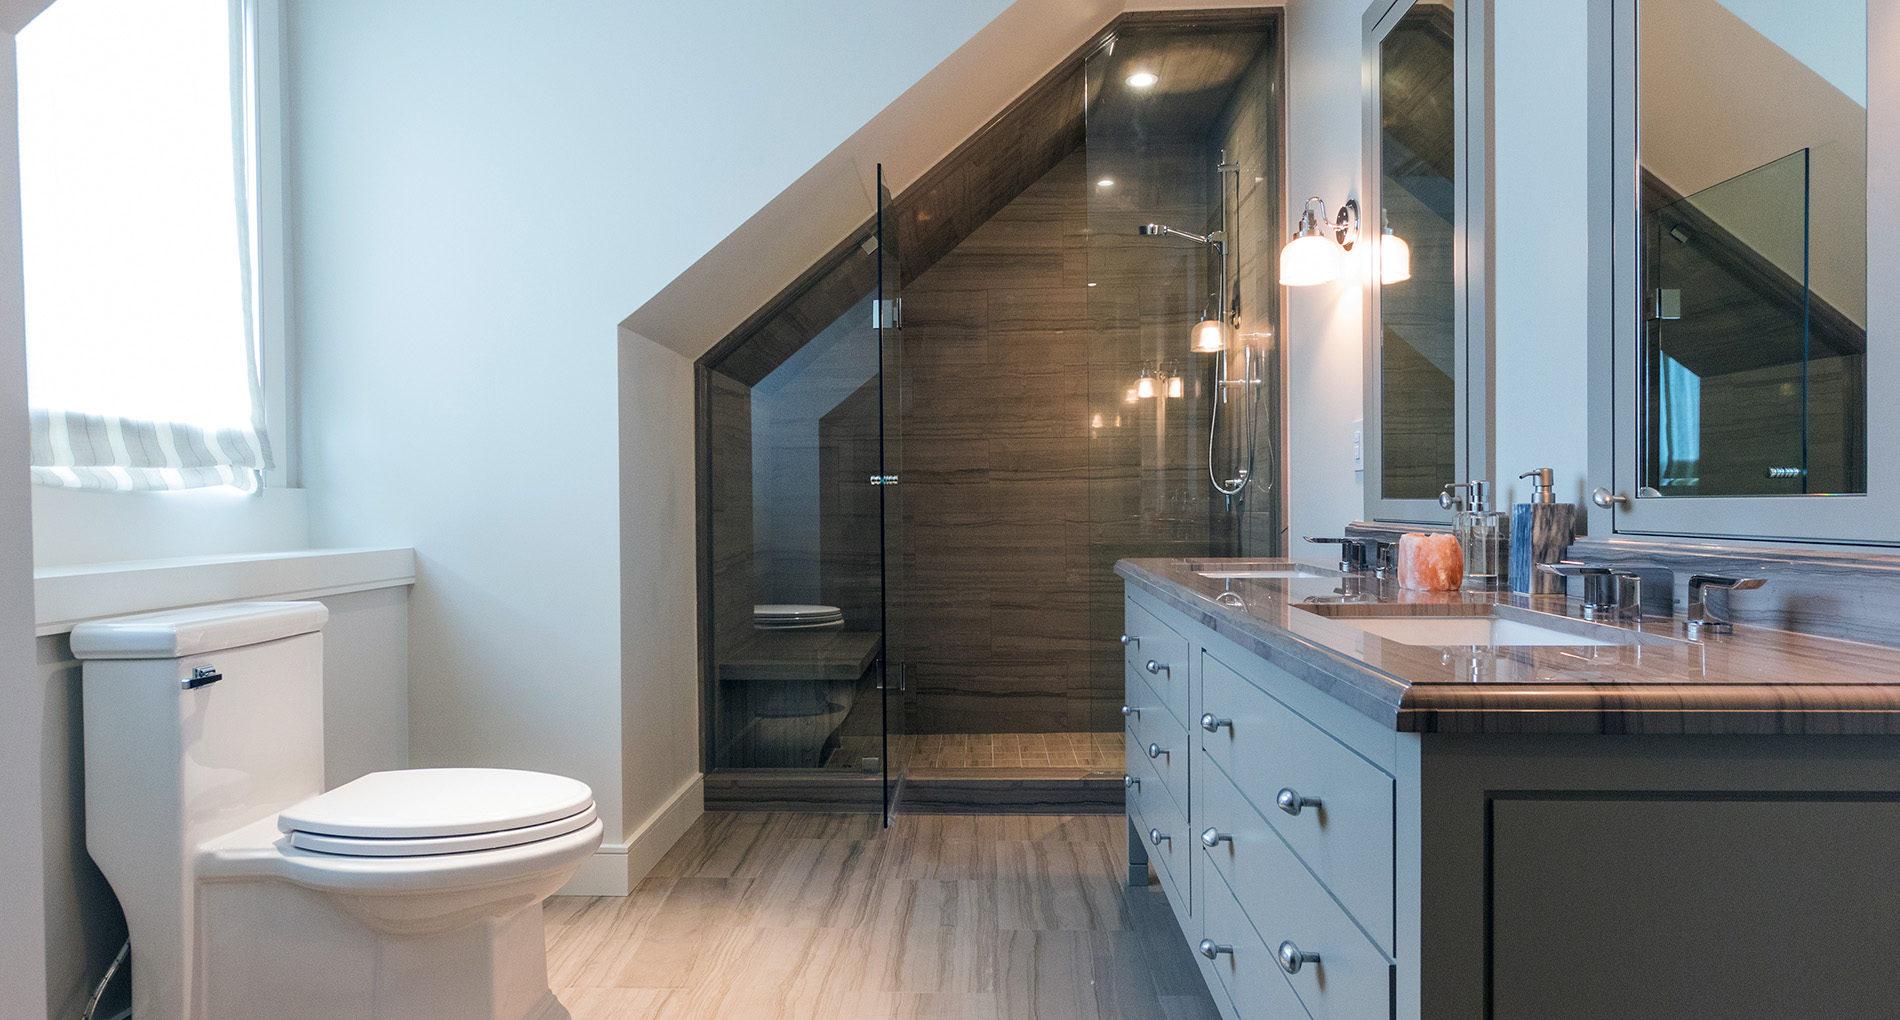 Bathroom Renovation Foresthill Howland Slider